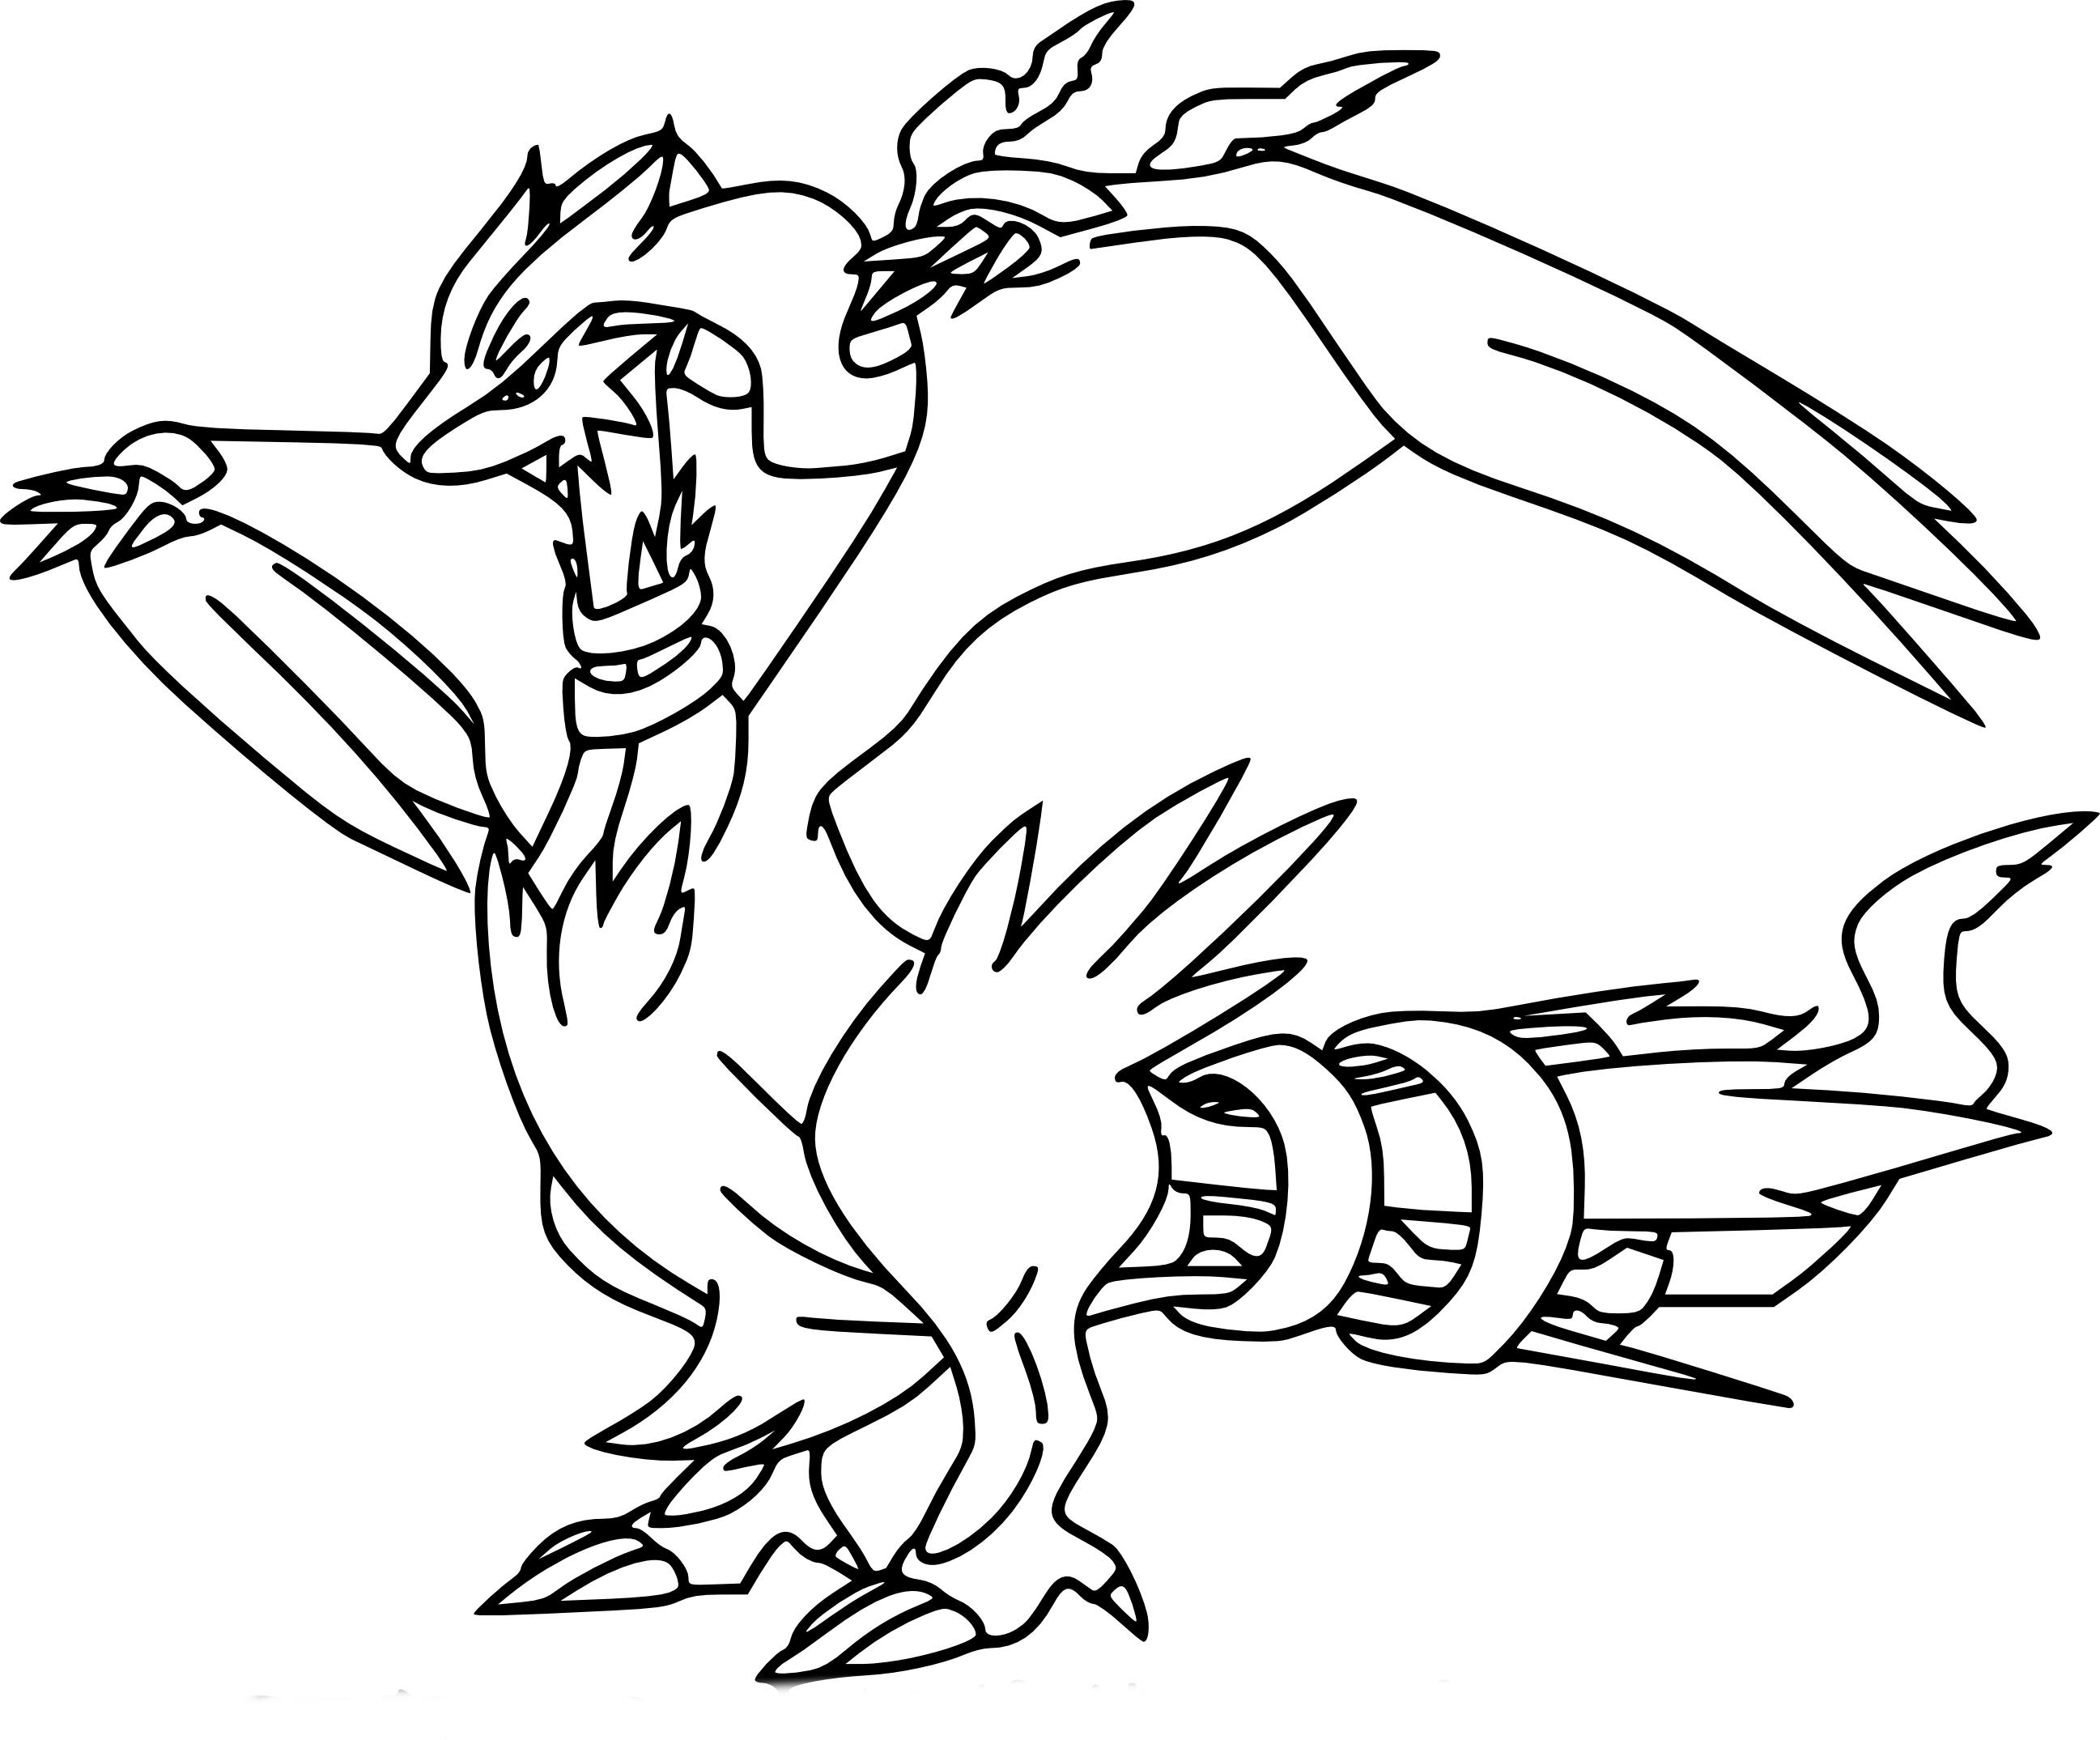 Coloriage Reshiram Pokemon A Imprimer